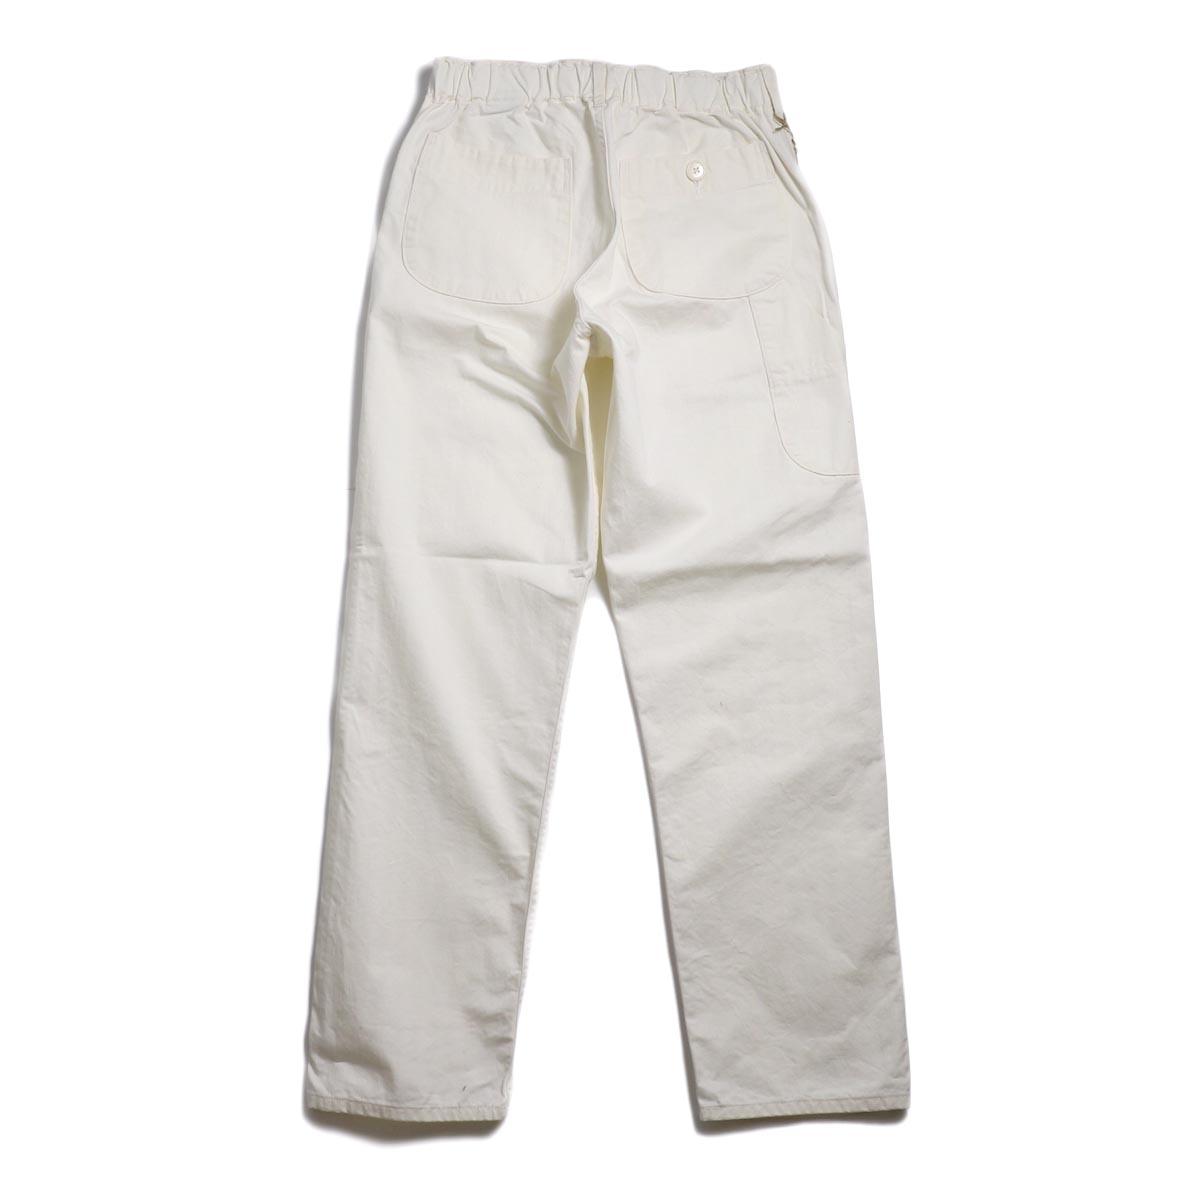 orSlow / French Work Pants -Ecru 背面